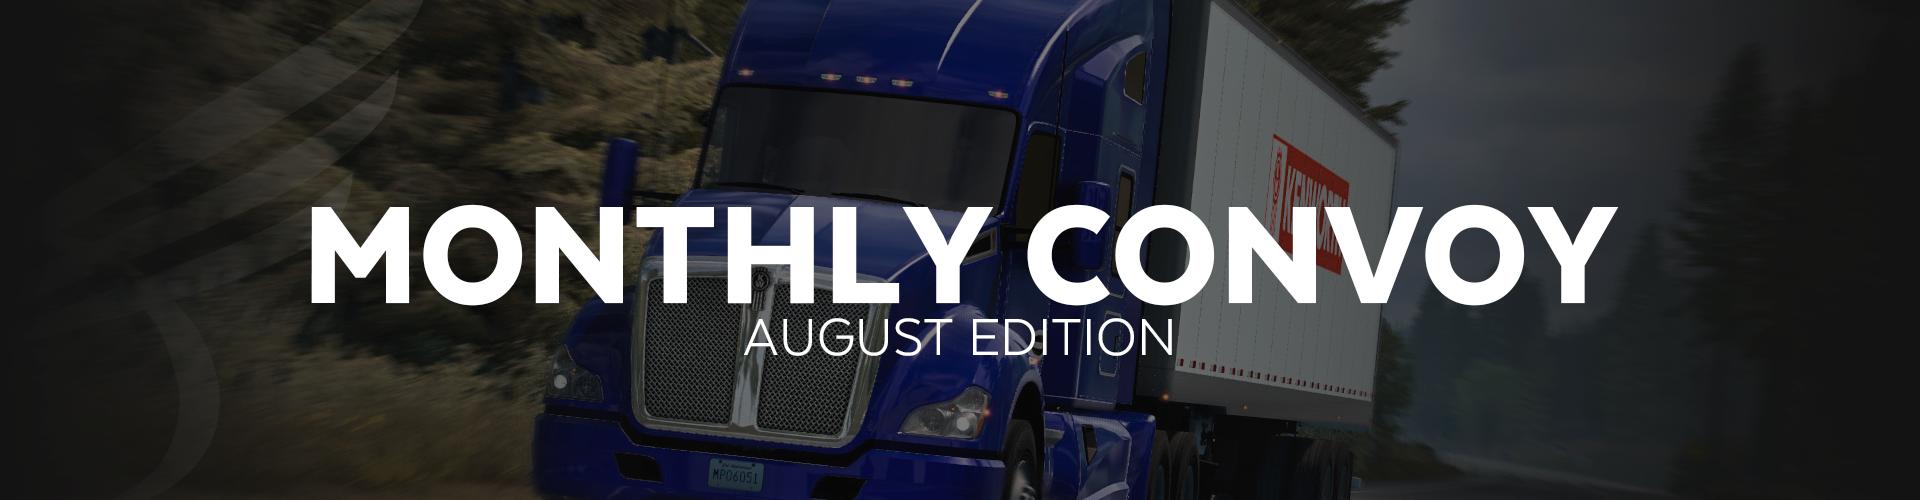 ALLIANCE Convoy - August Edition